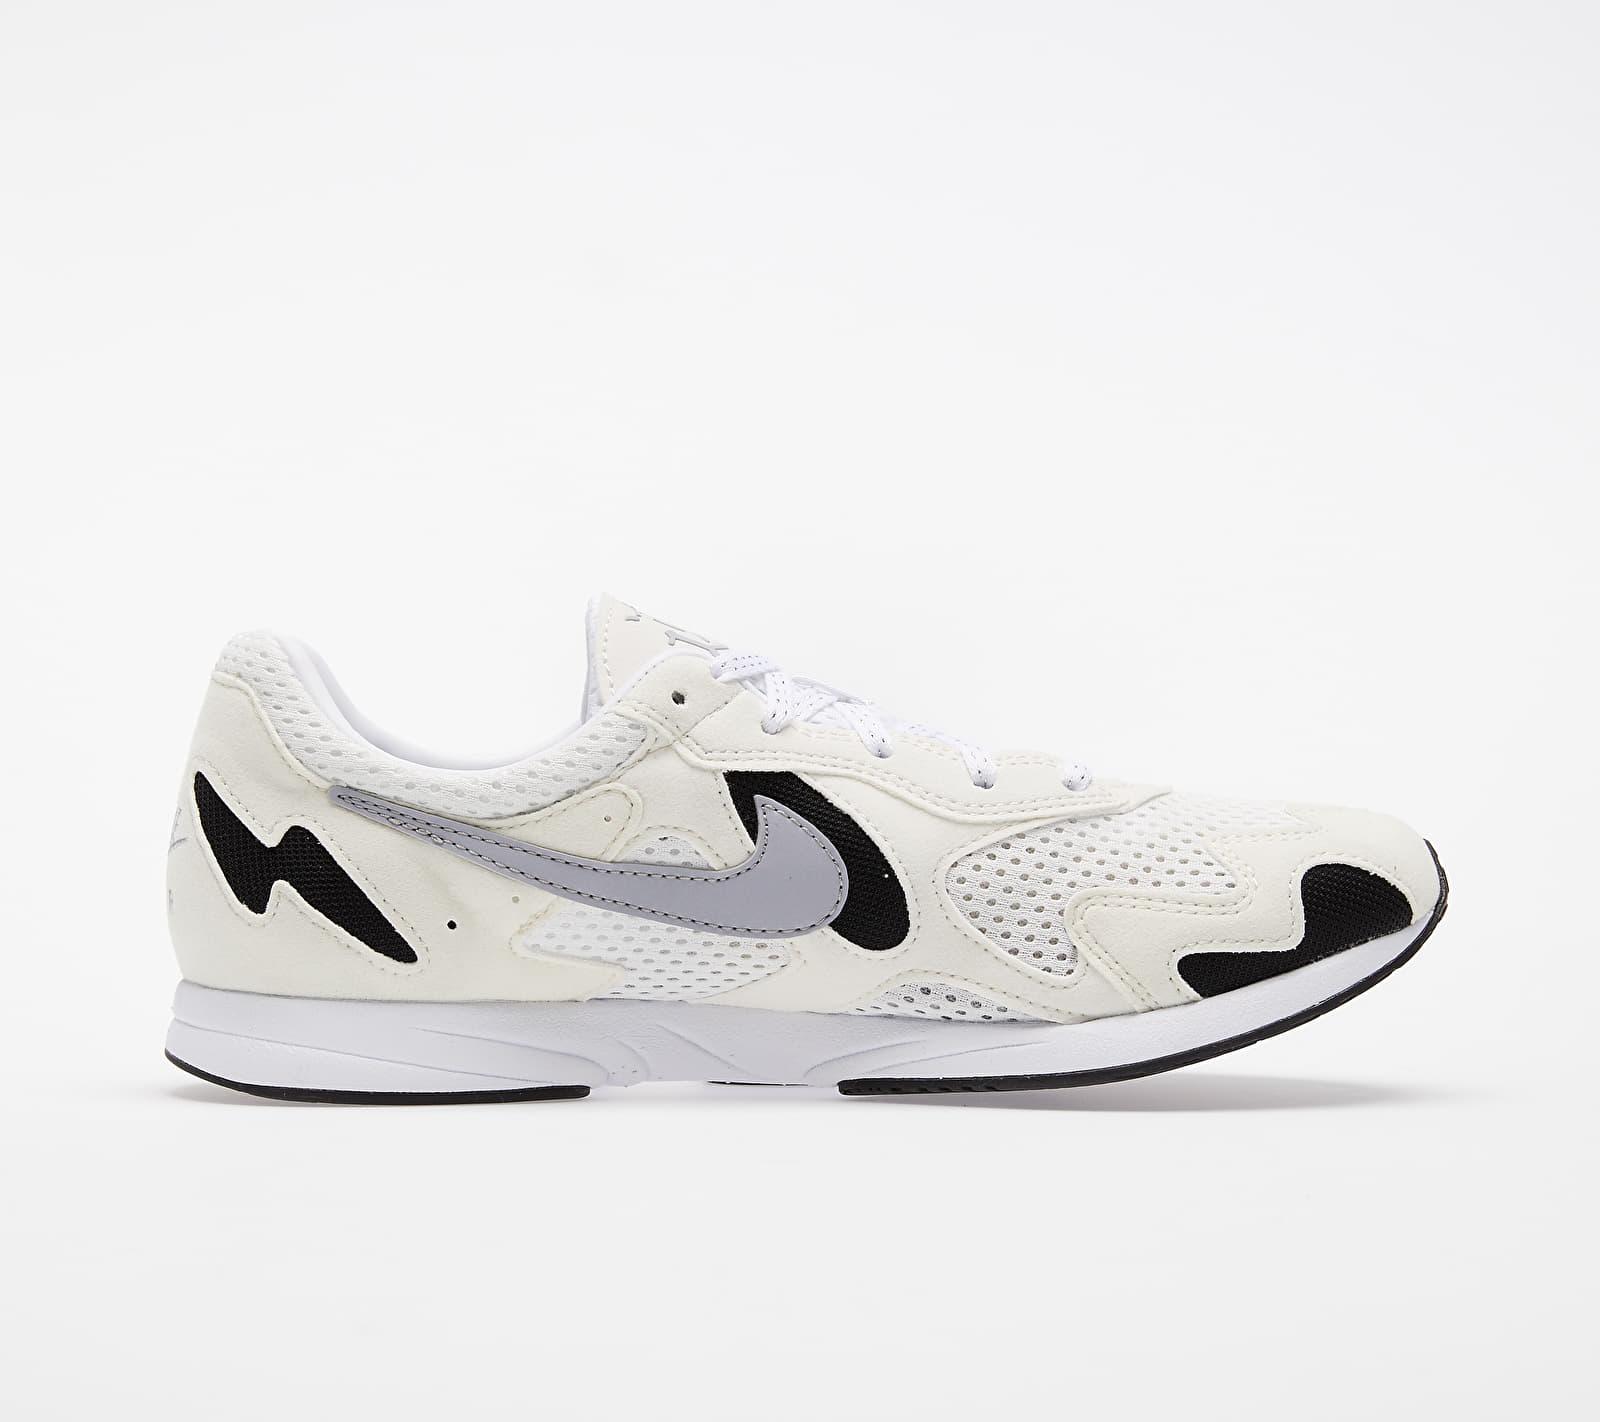 Nike Air Streak Lite Sail/ Wolf Grey-Black-Summit White, Brown